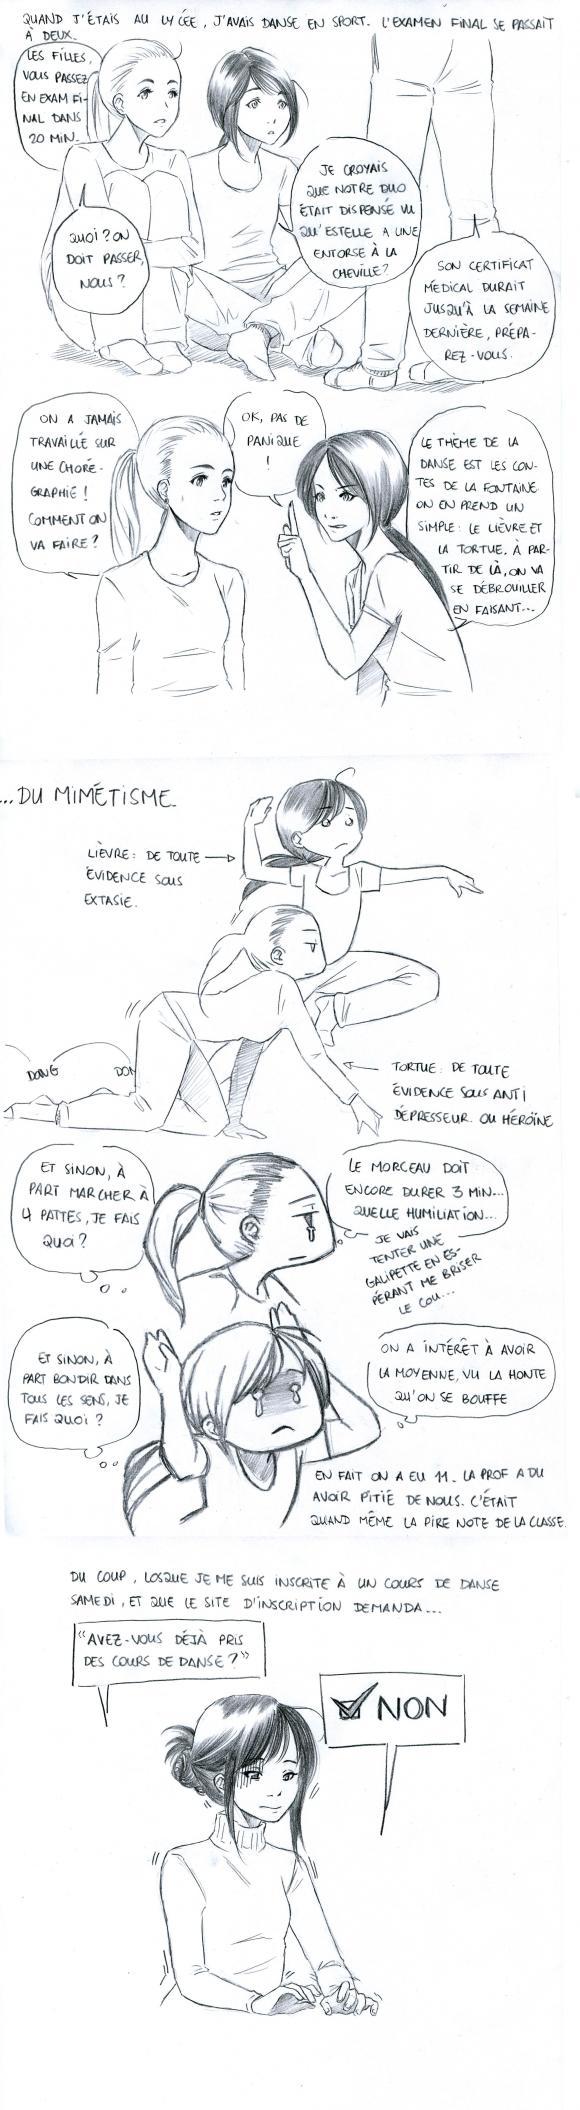 http://laceliah.cowblog.fr/images/Striplife/danse.jpg